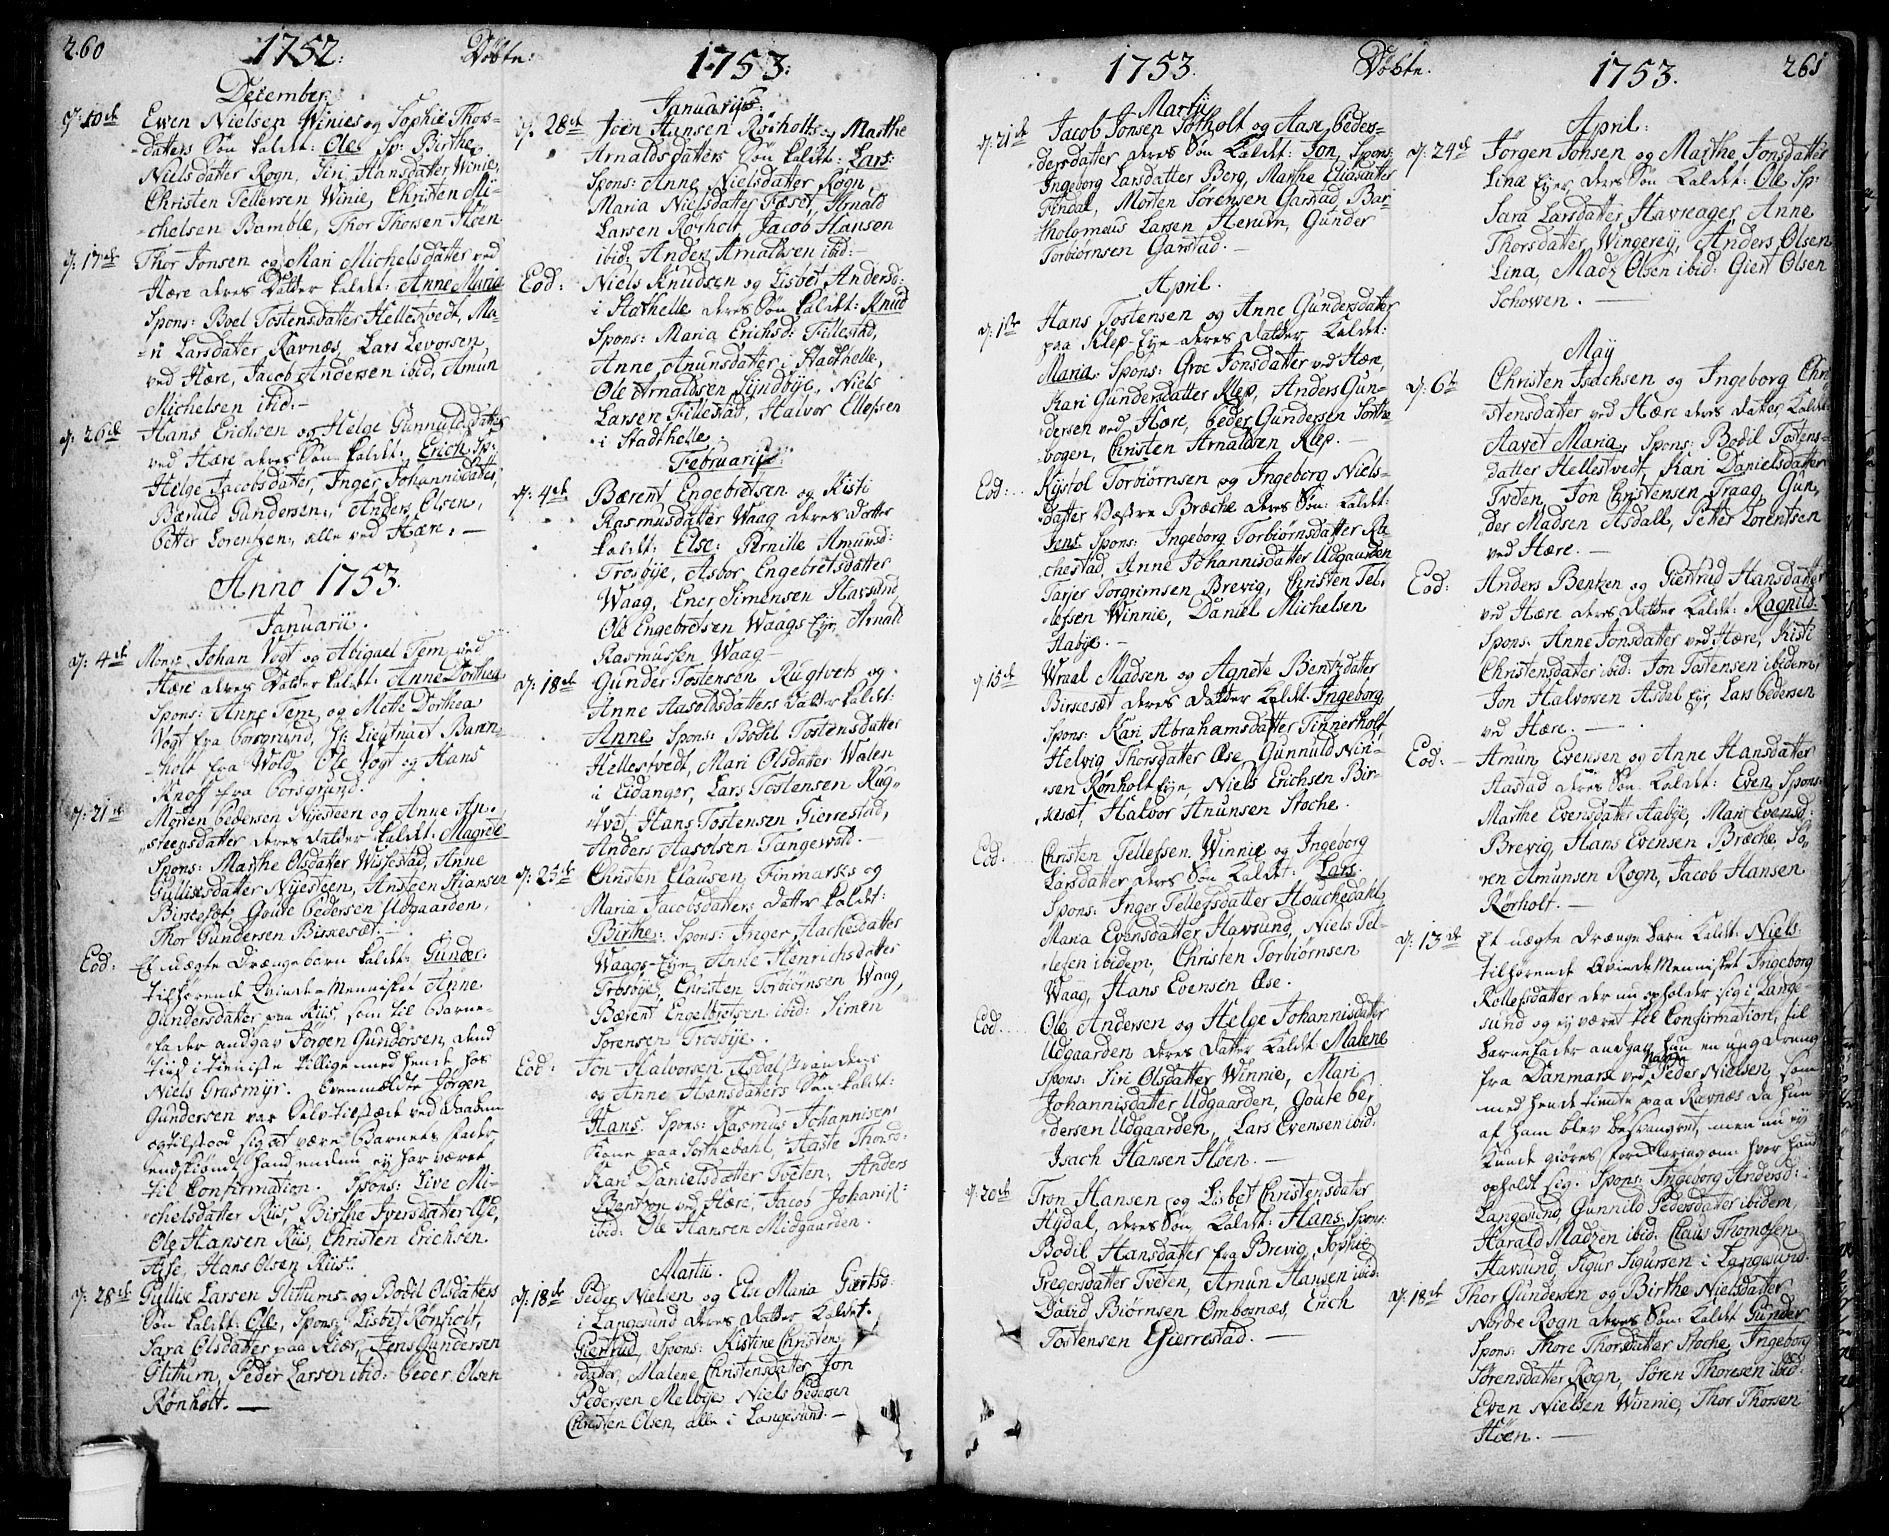 SAKO, Bamble kirkebøker, F/Fa/L0001: Ministerialbok nr. I 1, 1702-1774, s. 260-261